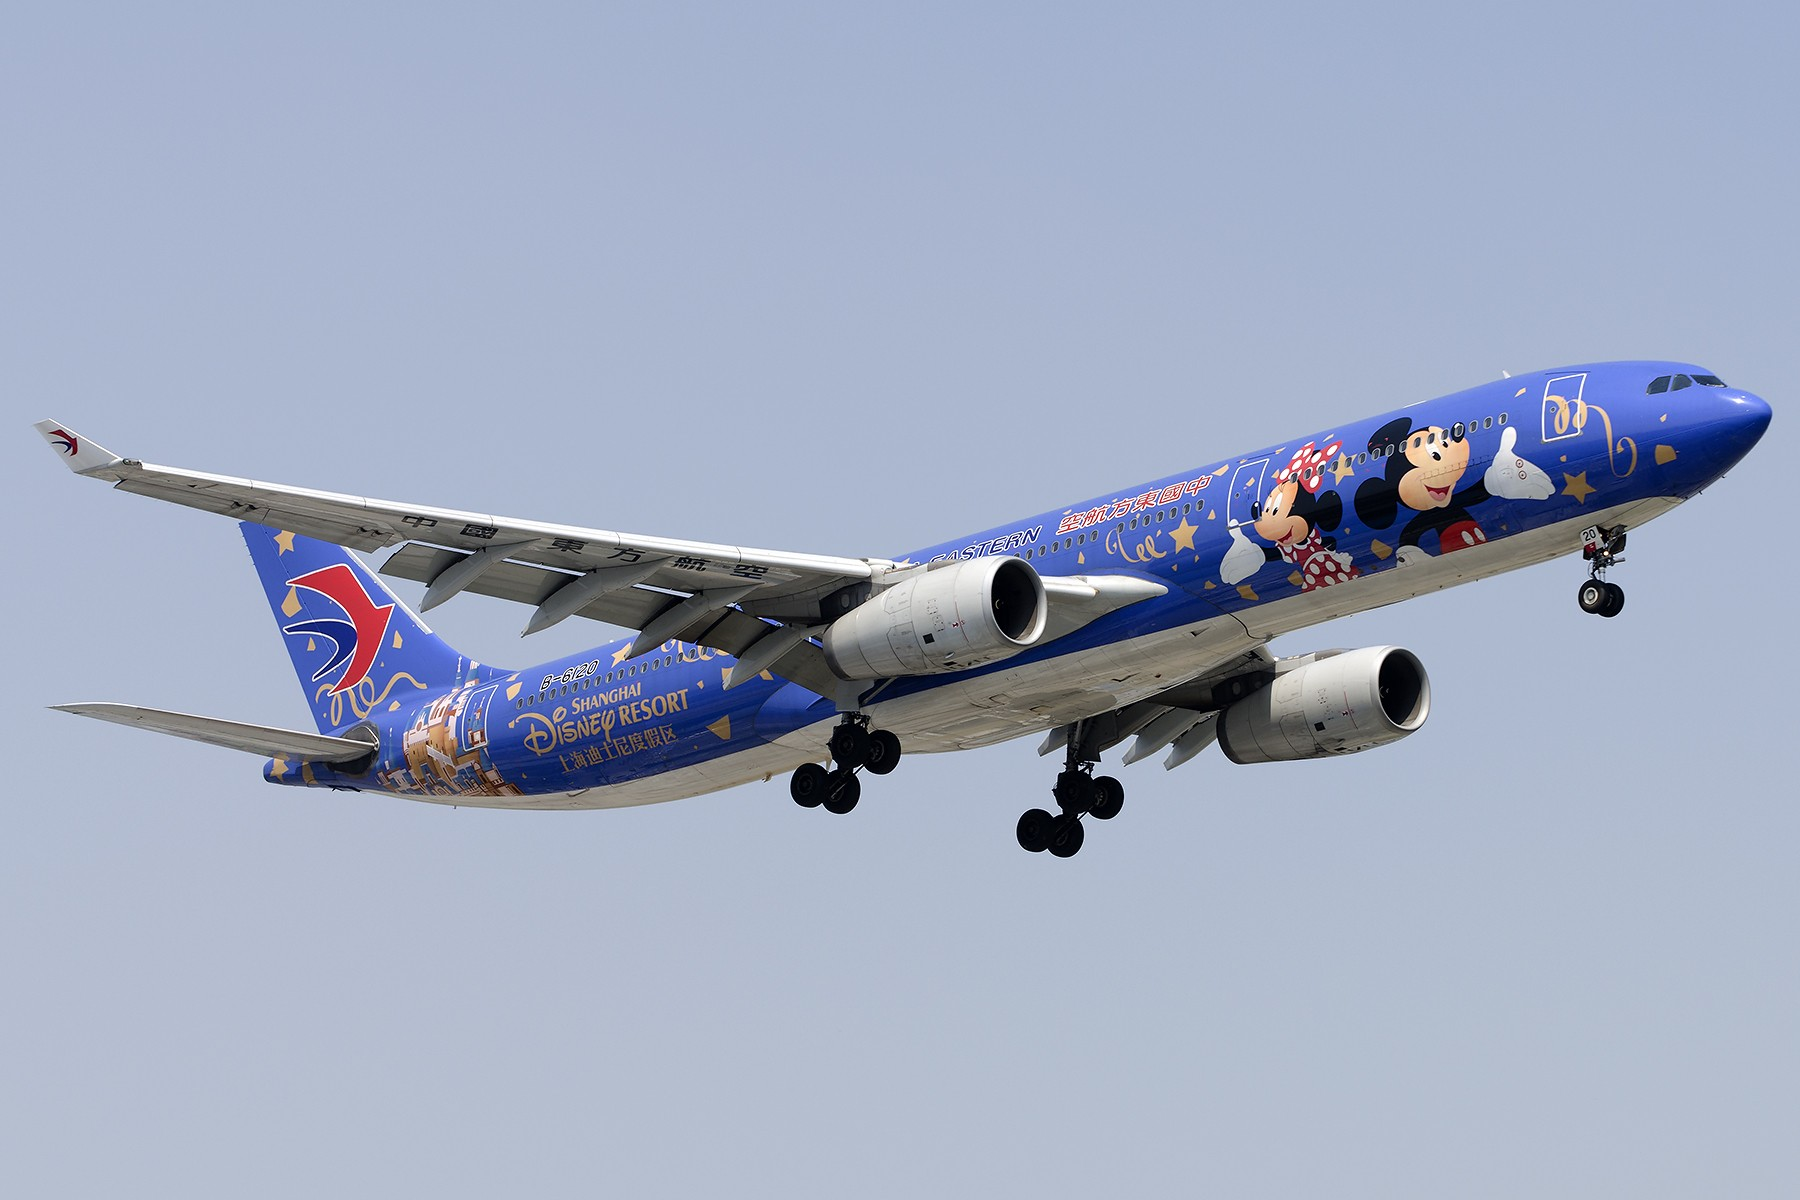 Re:[原创][原创]【SHA拍机*1800大图】4月拍的了,记得那天好货还挺多 AIRBUS A330-300 B-6120 中国上海虹桥国际机场